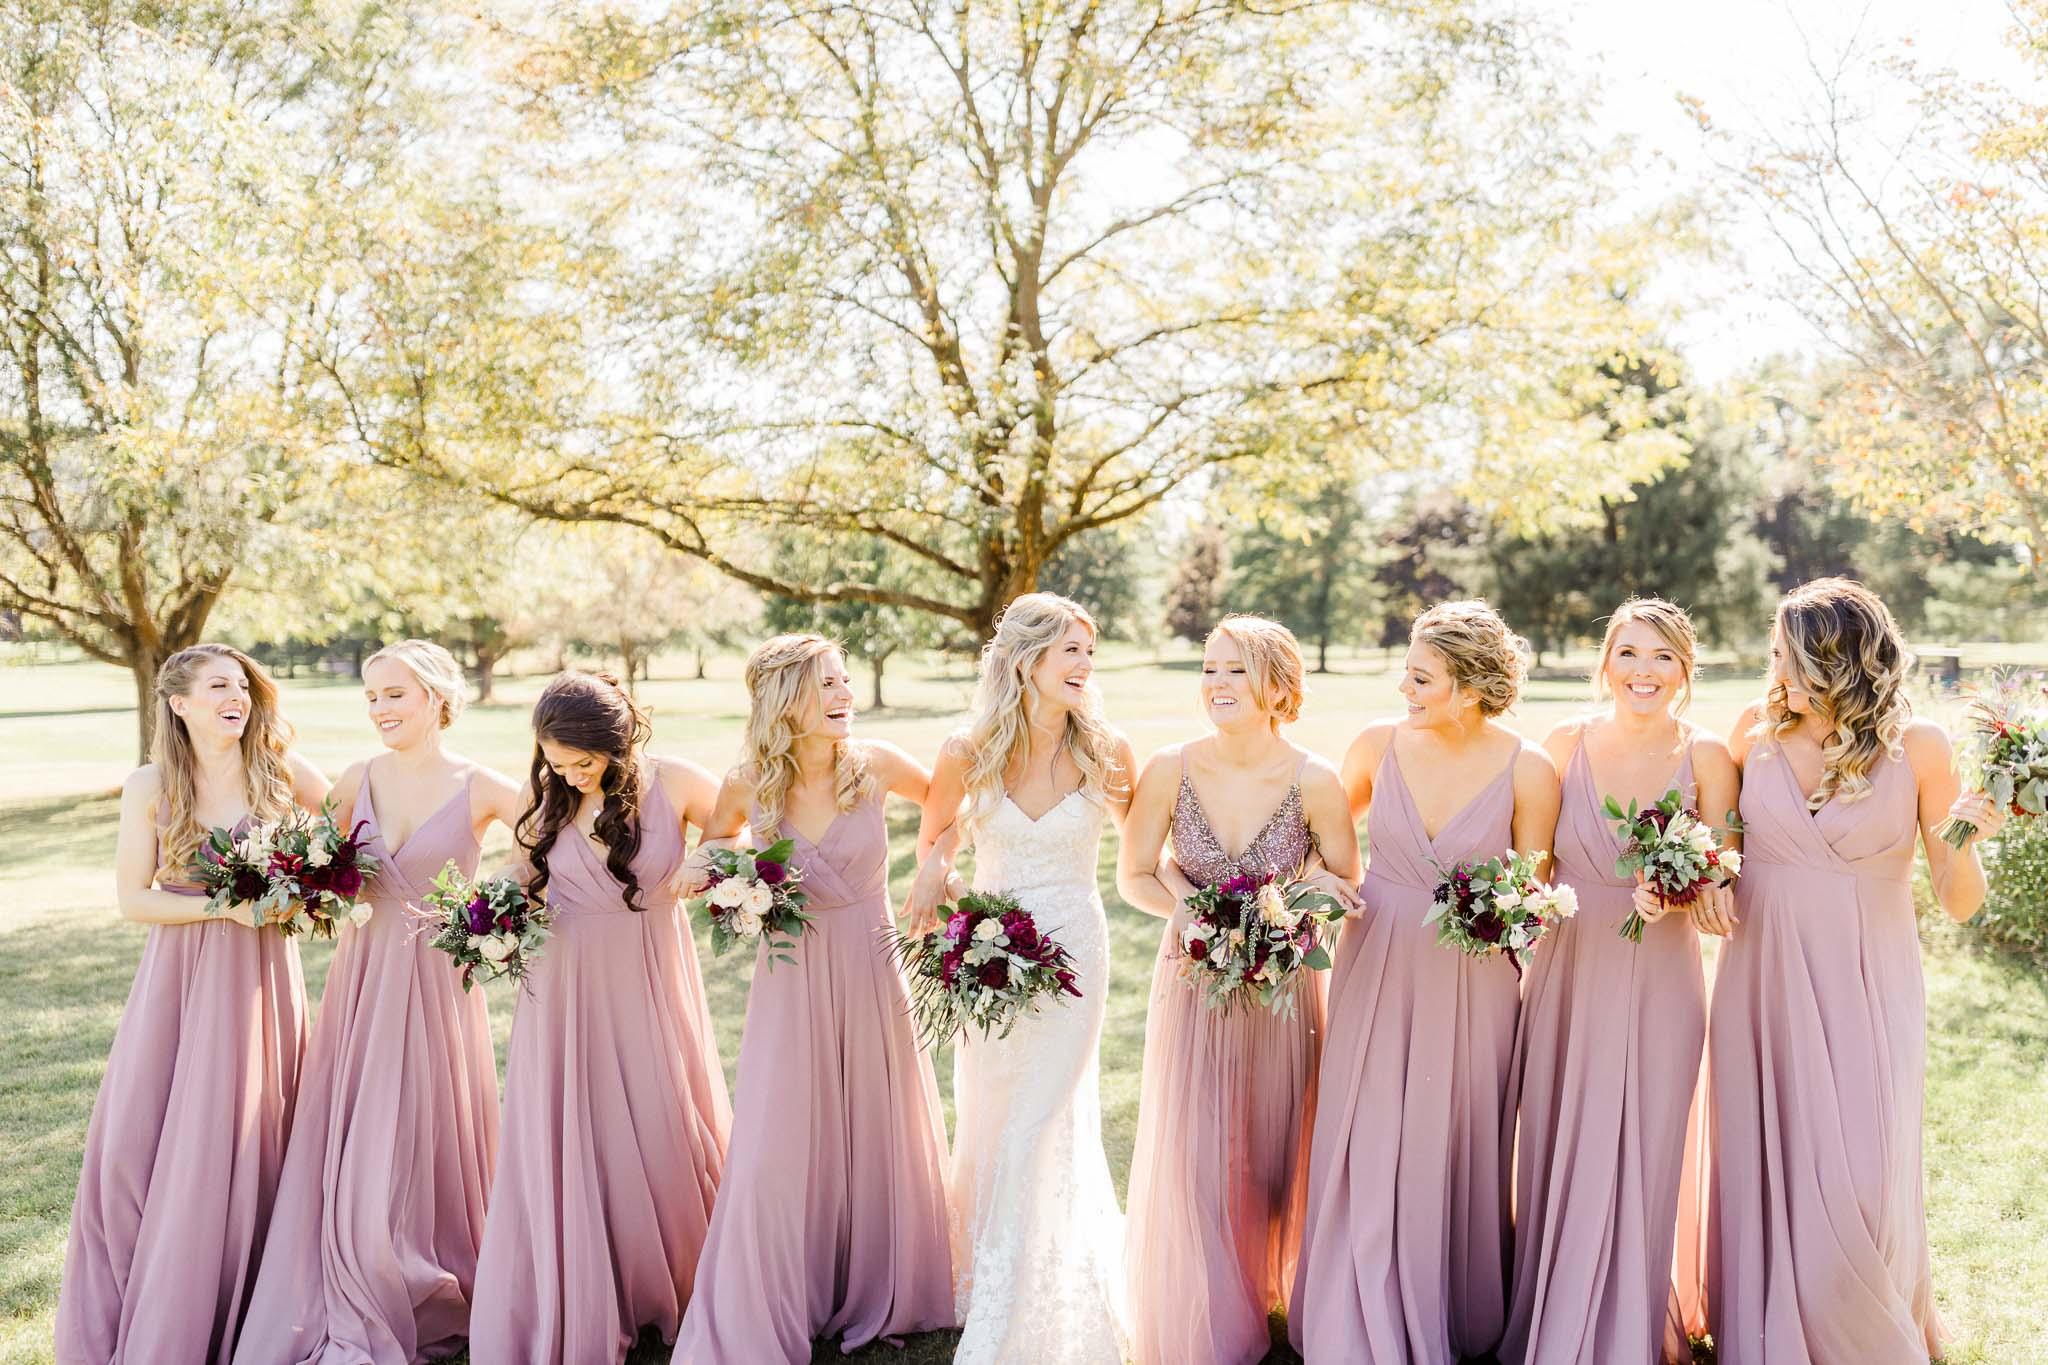 Frosty-Valley-September-Wedding-7577.jpg